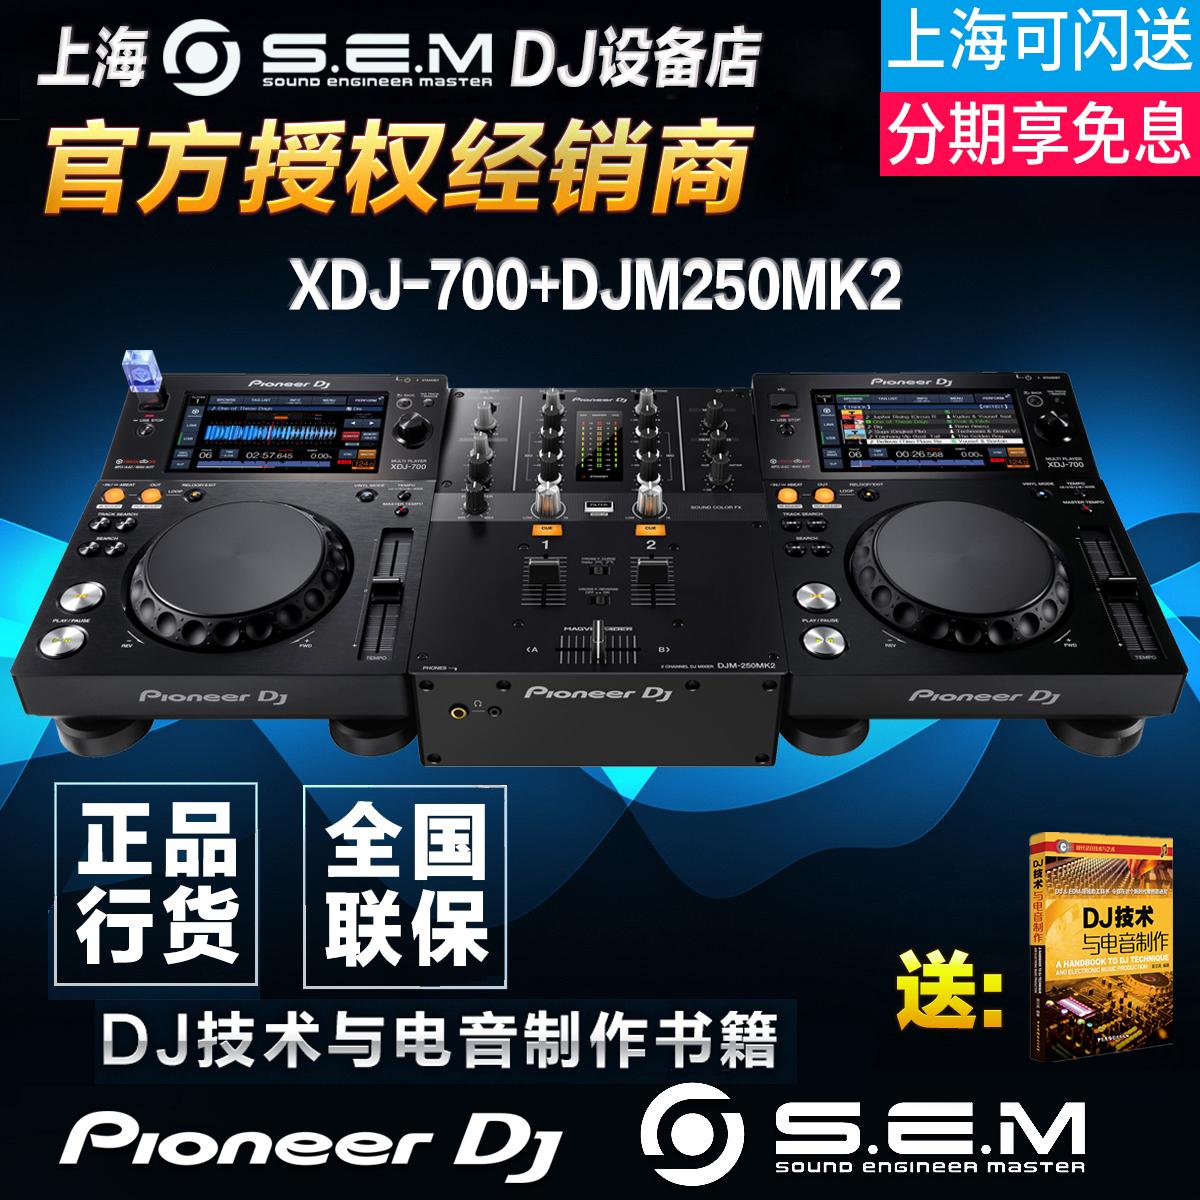 Pioneer/先锋 XDJ-700打碟机+DJM250 MK2混音台 打碟机套装 行货,可领取220元淘宝优惠券